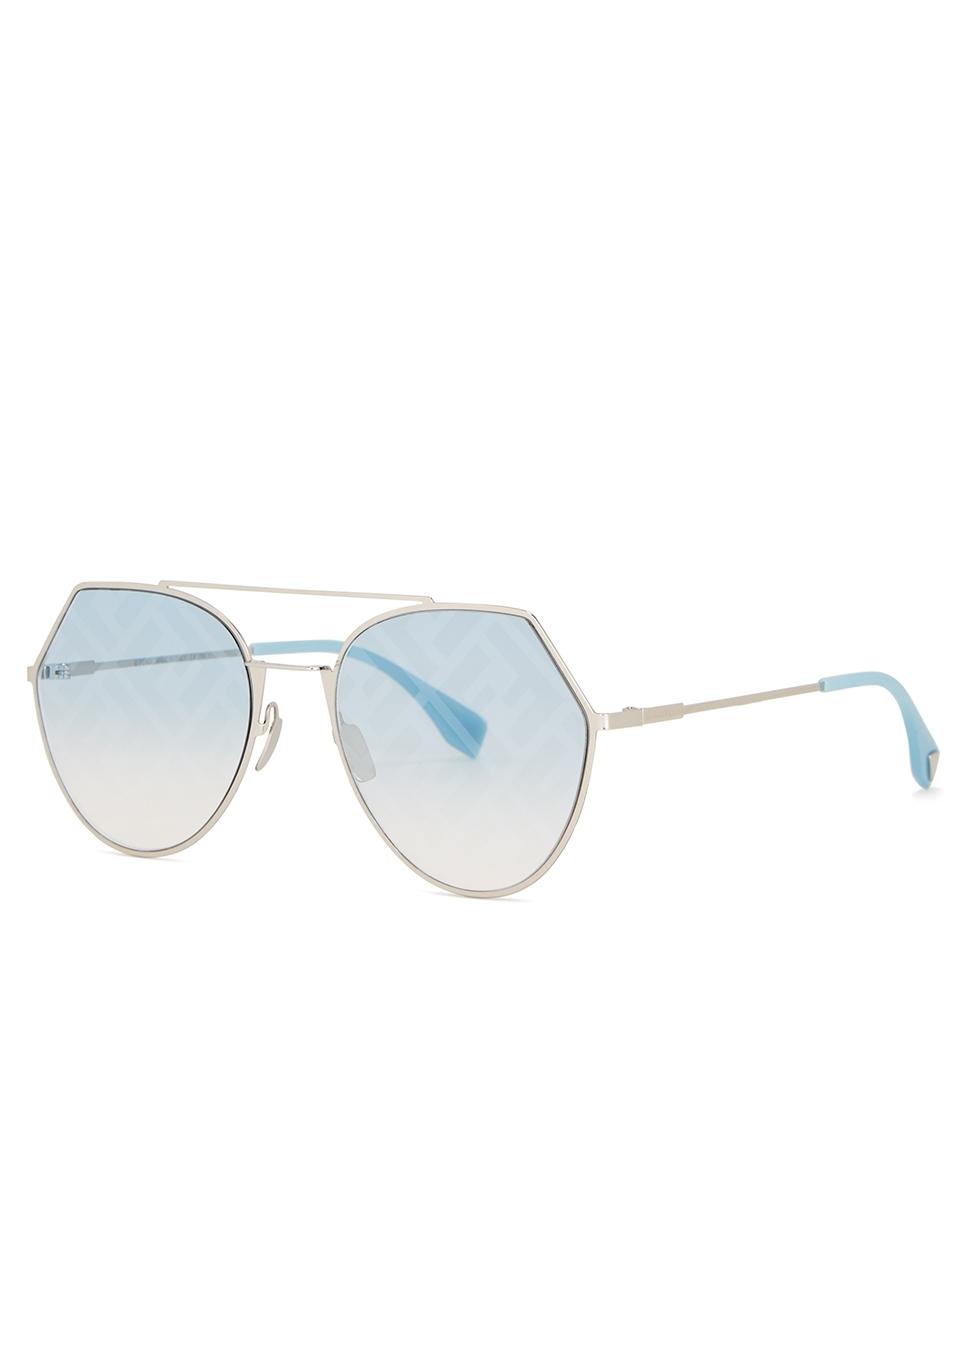 f102ee11a8f7a Women s Designer Sunglasses and Eyewear - Harvey Nichols